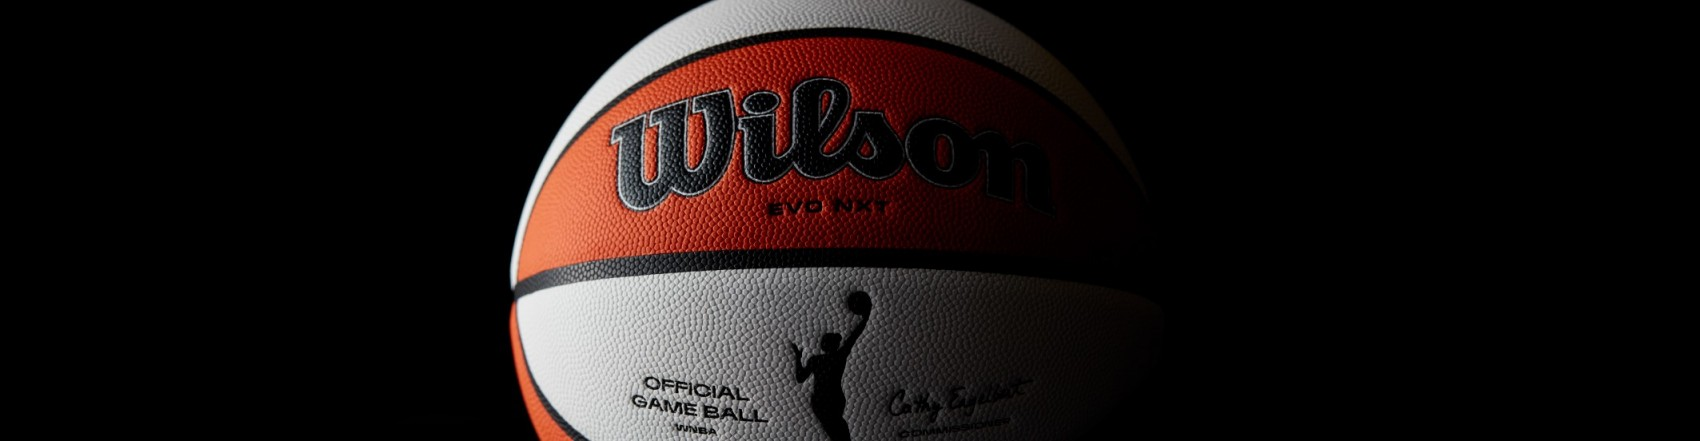 Basketballschuhe